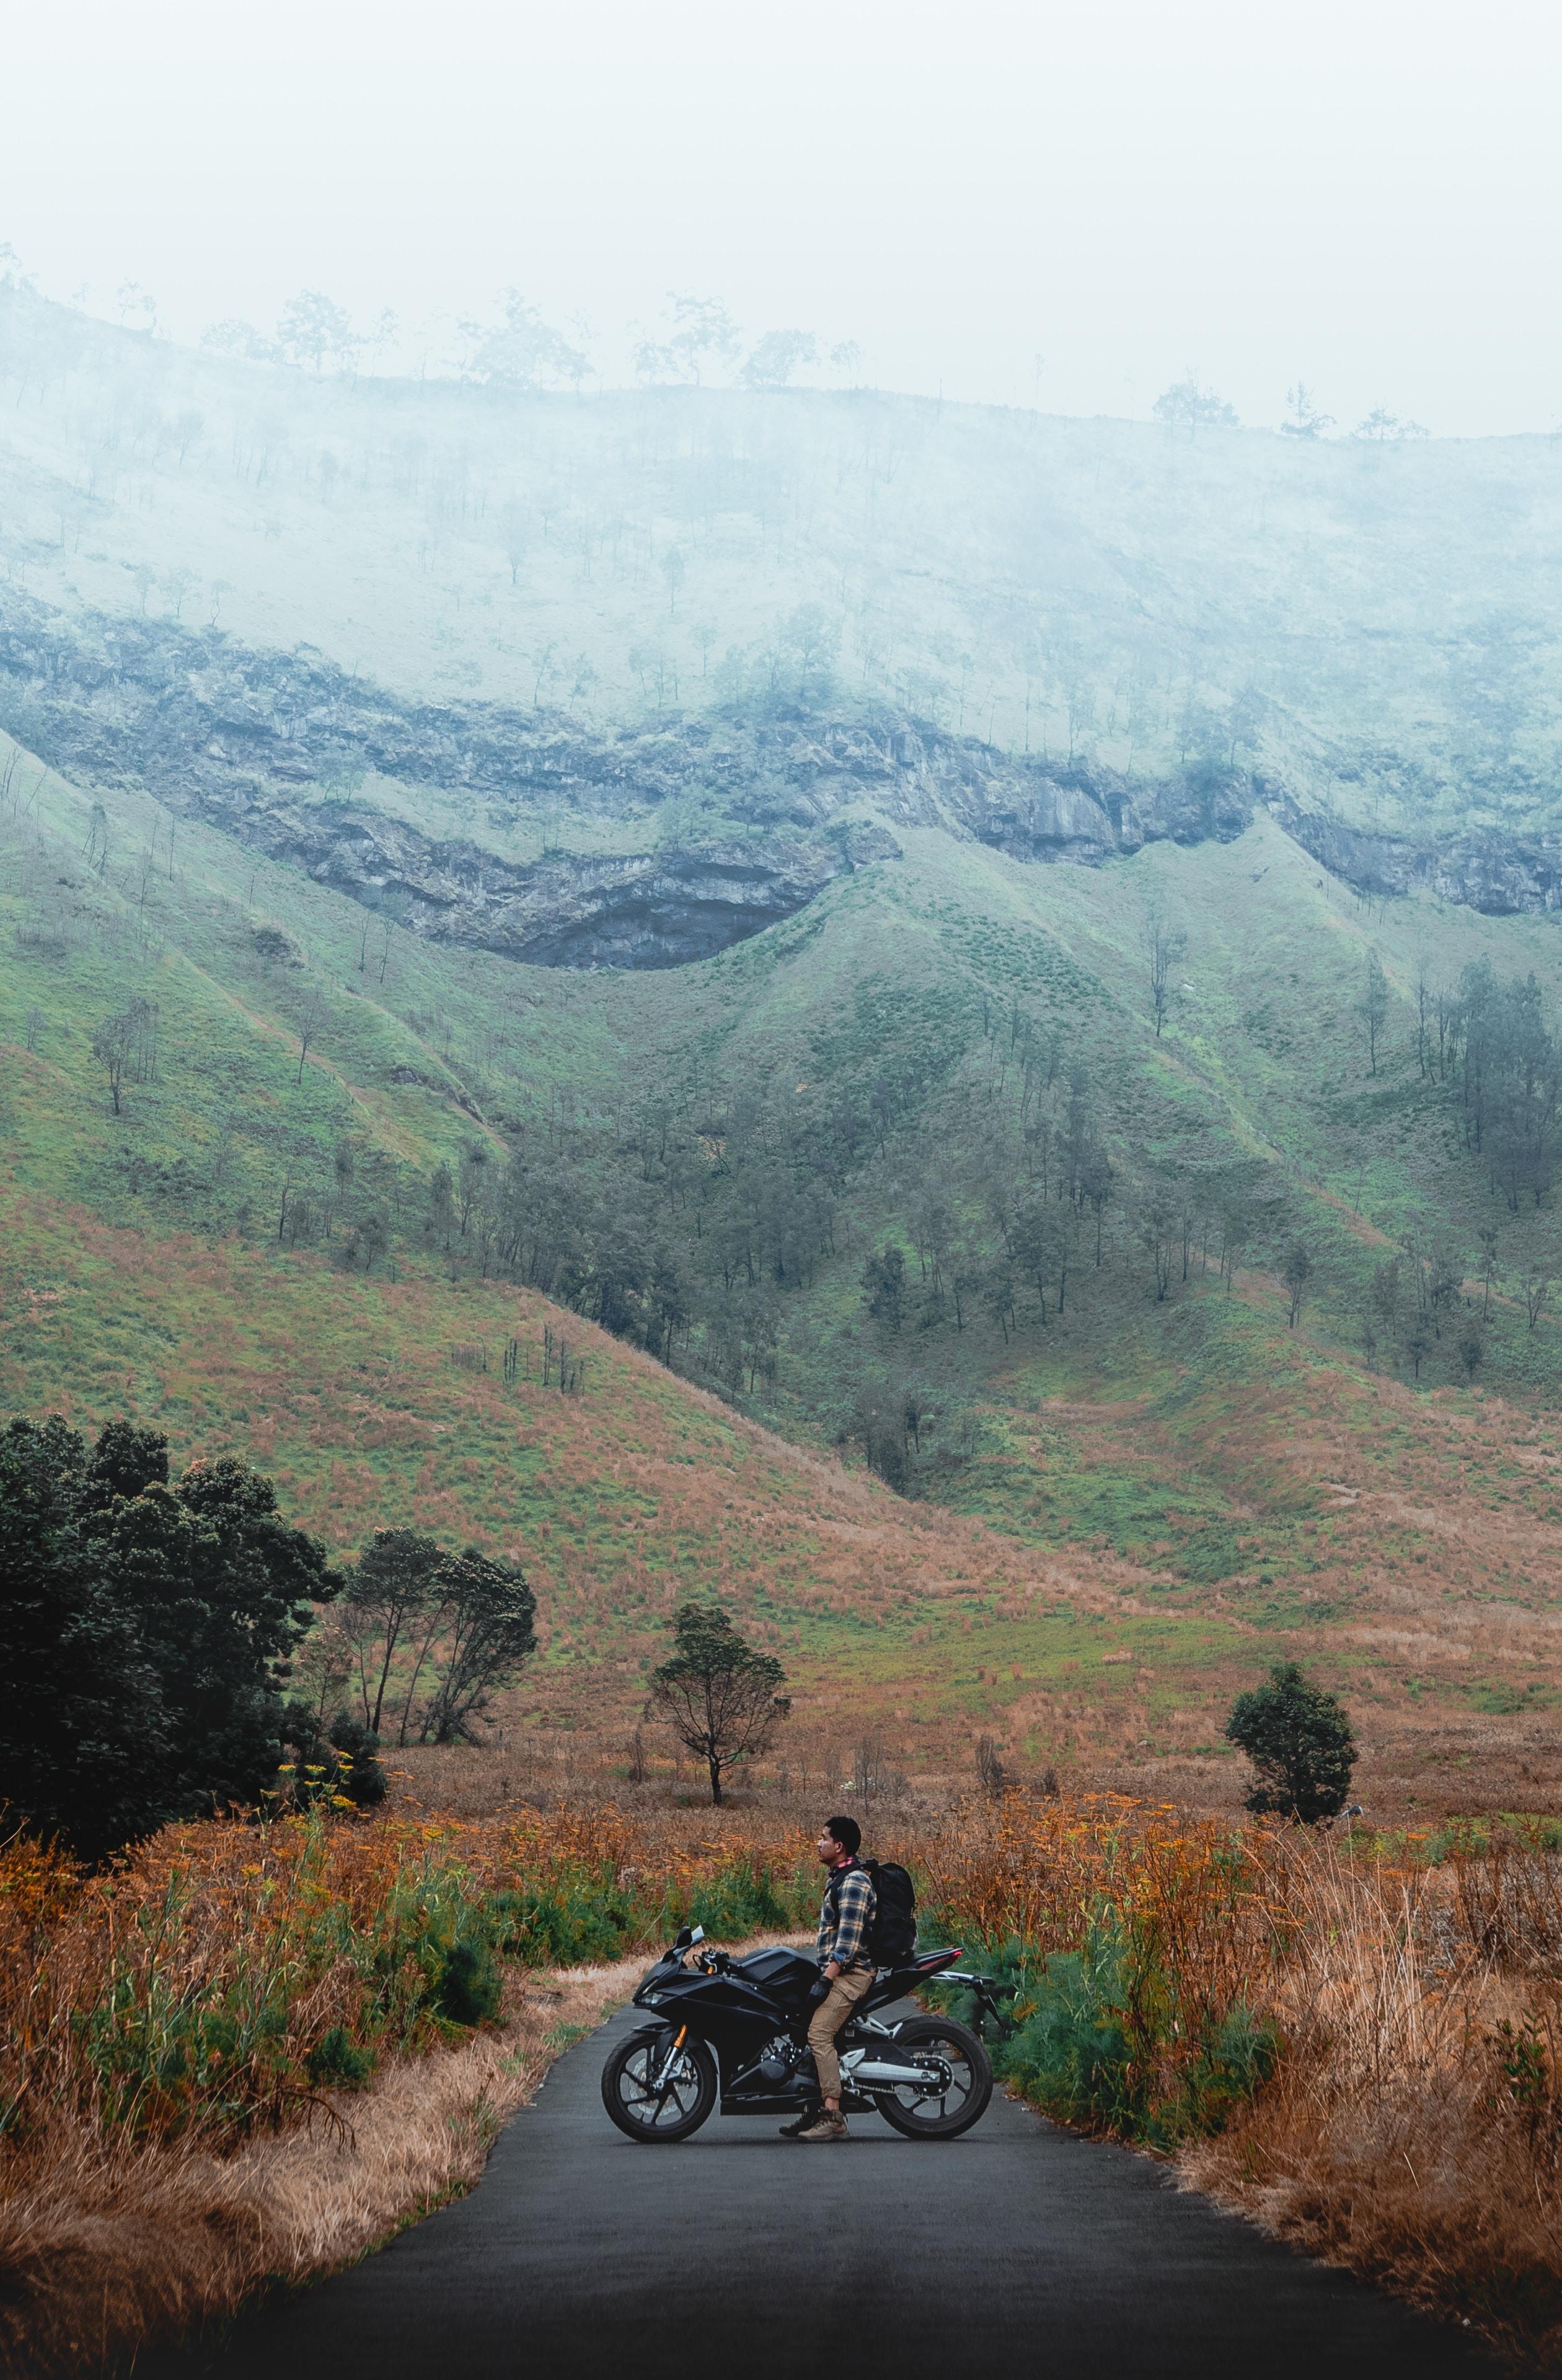 man riding on motorcycle near mountain